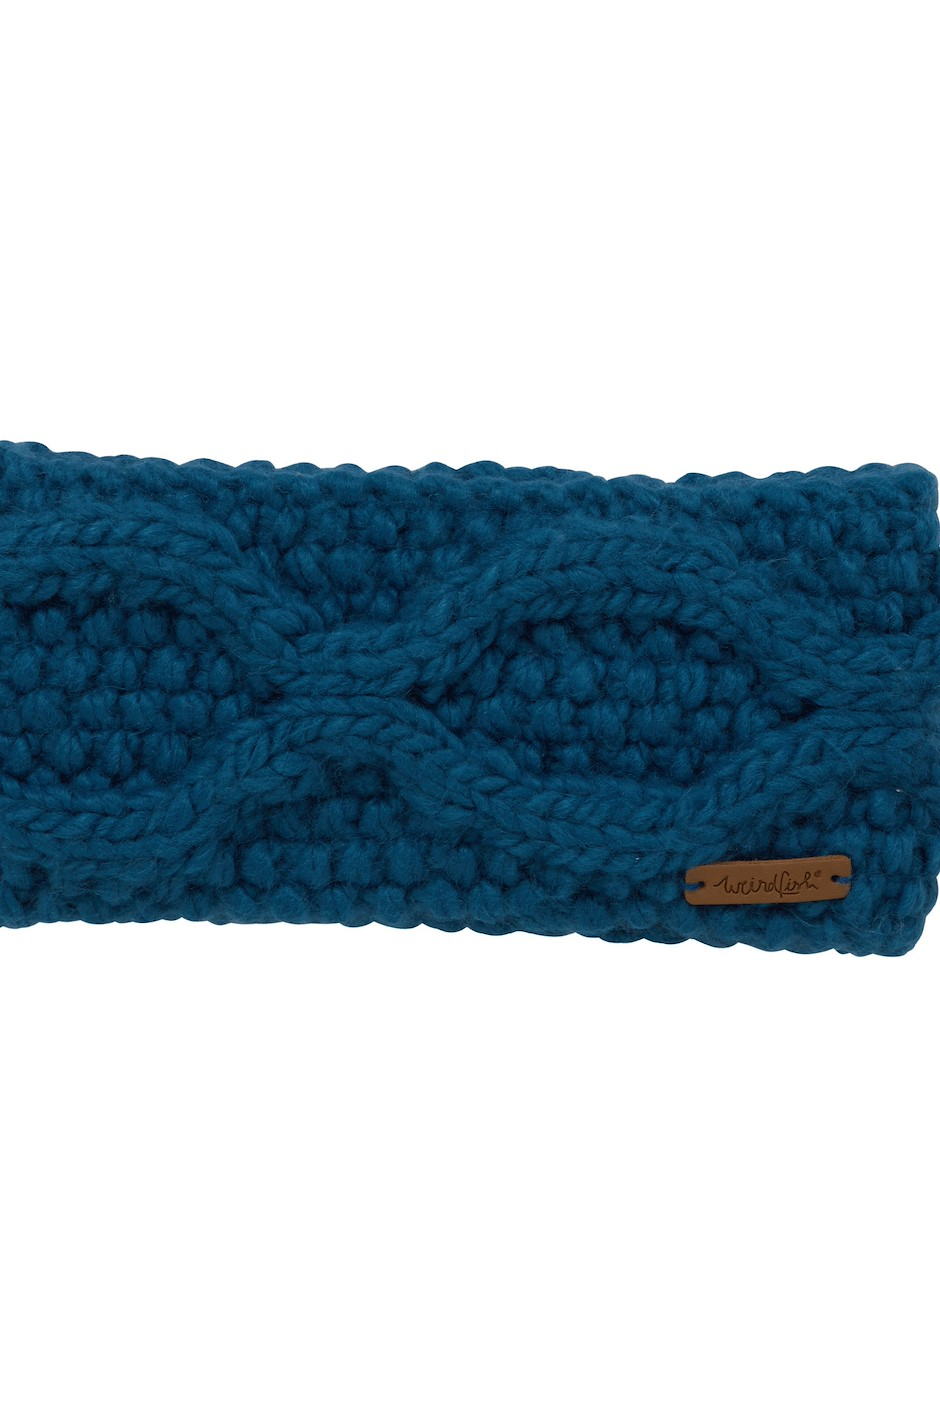 Ellor Chunky Cable Knit Headband Storm Blue